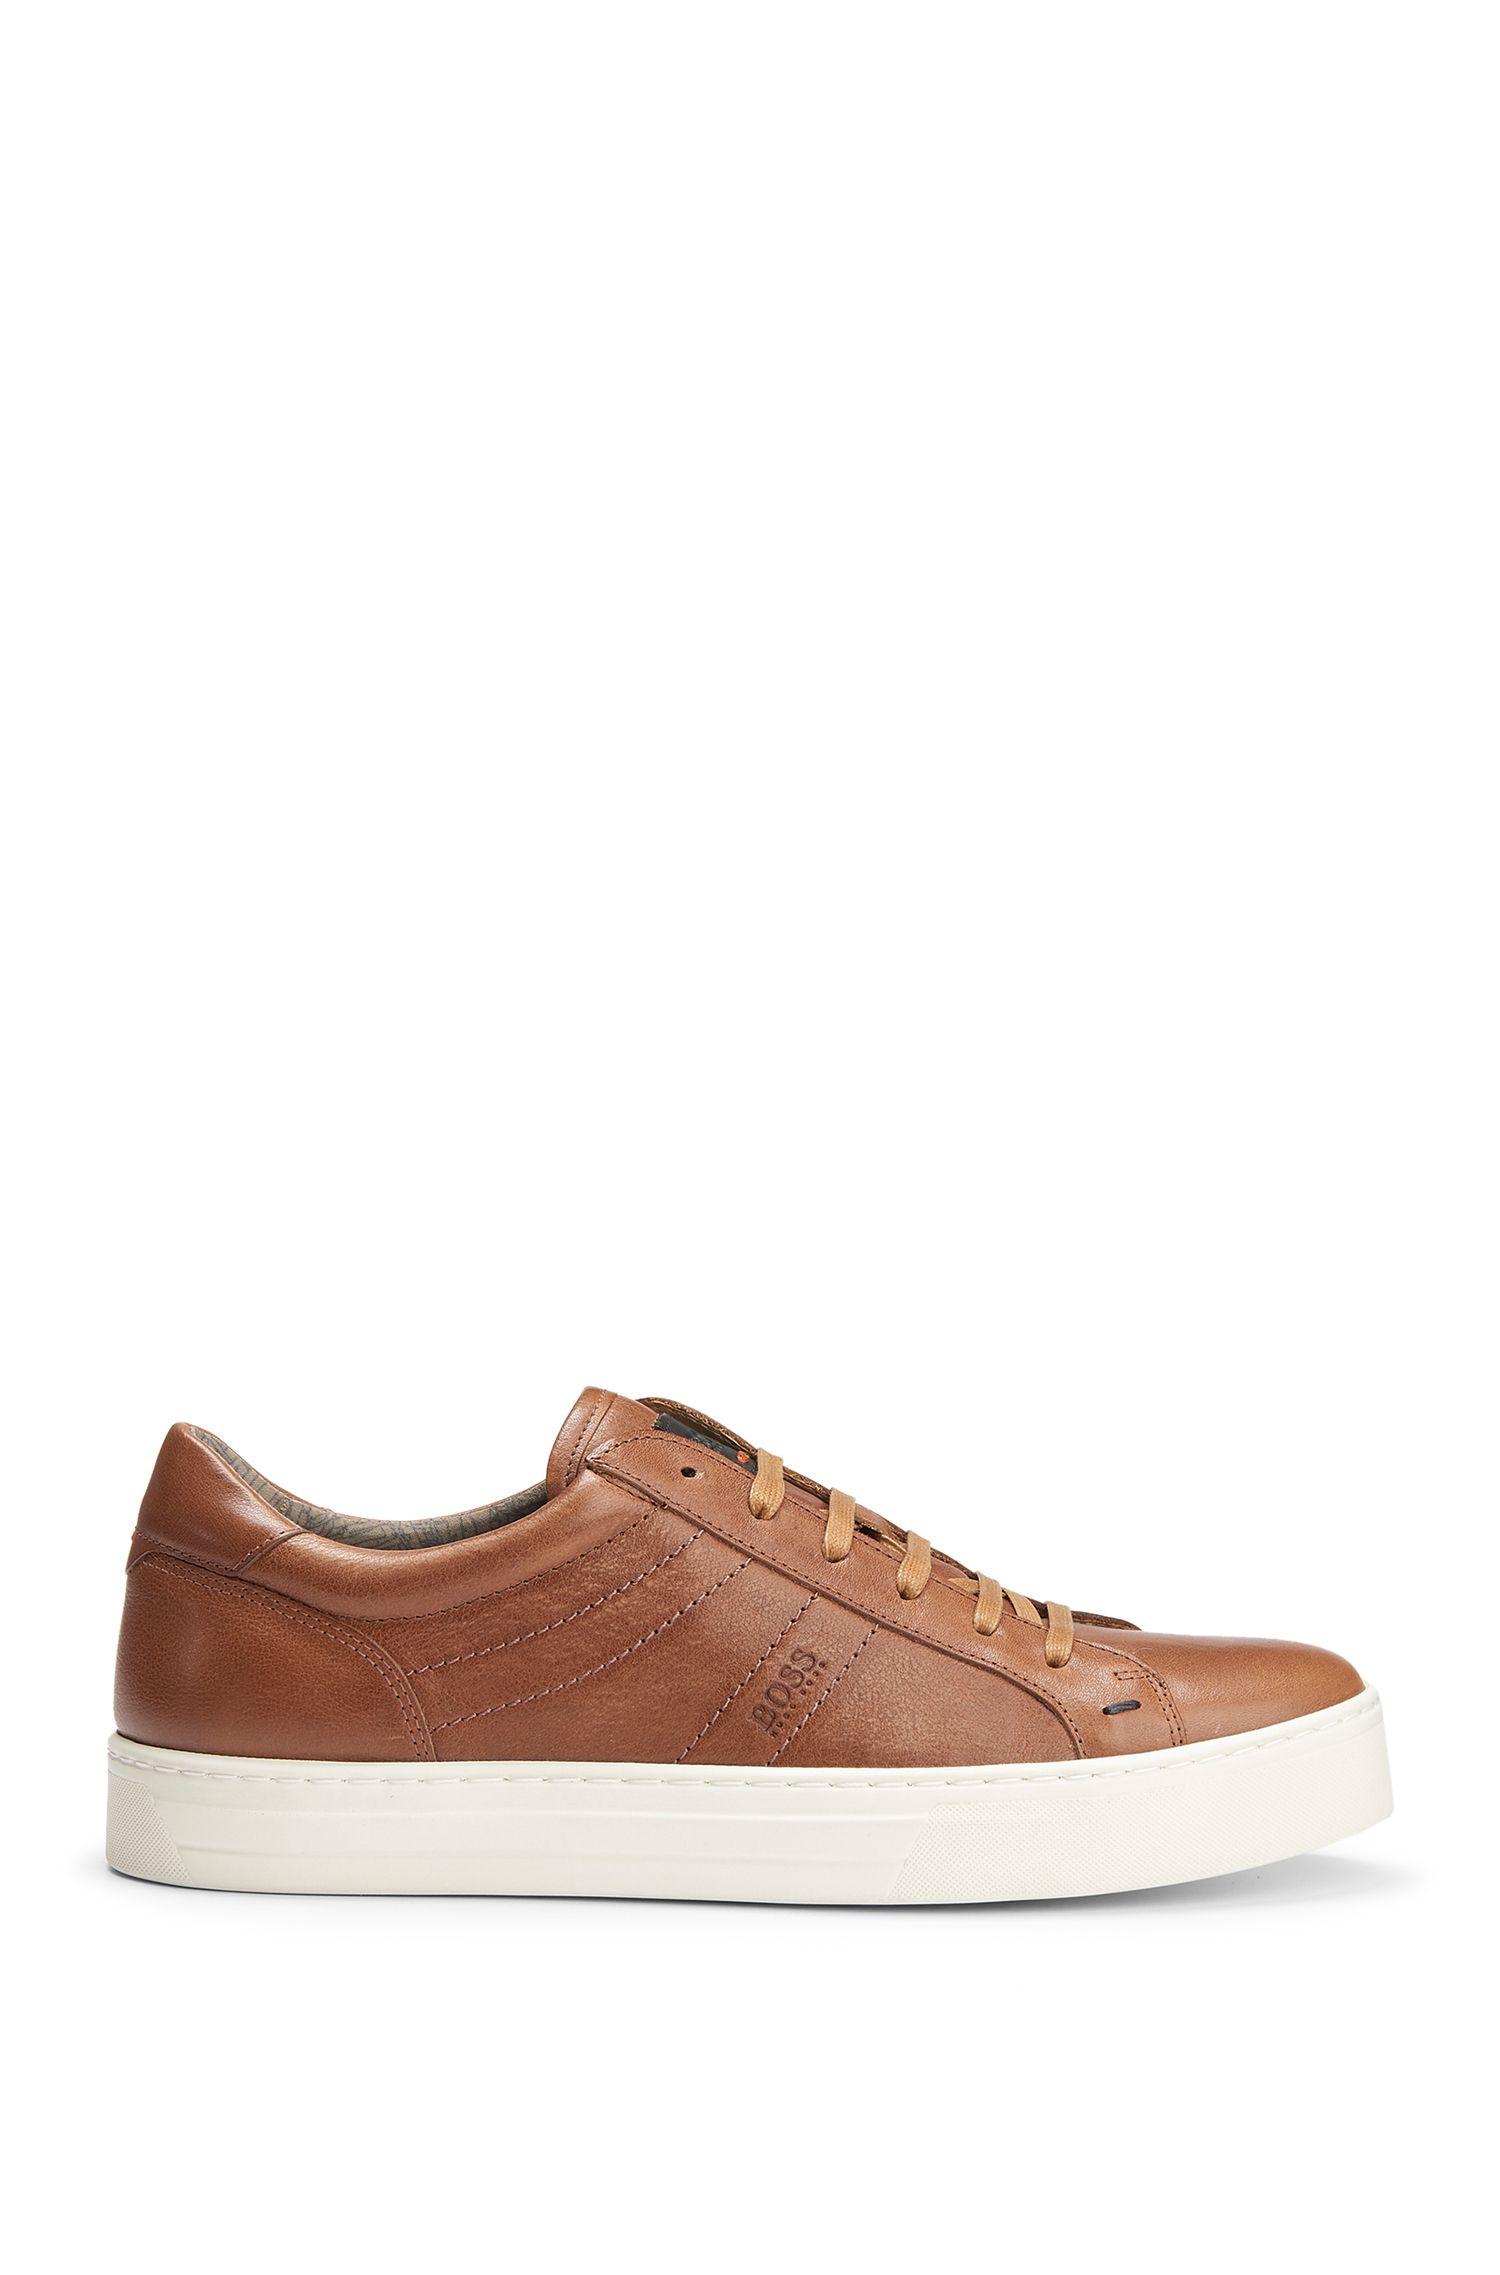 Calfskin Vintage Sneaker   Noir Tenn Itws, Brown